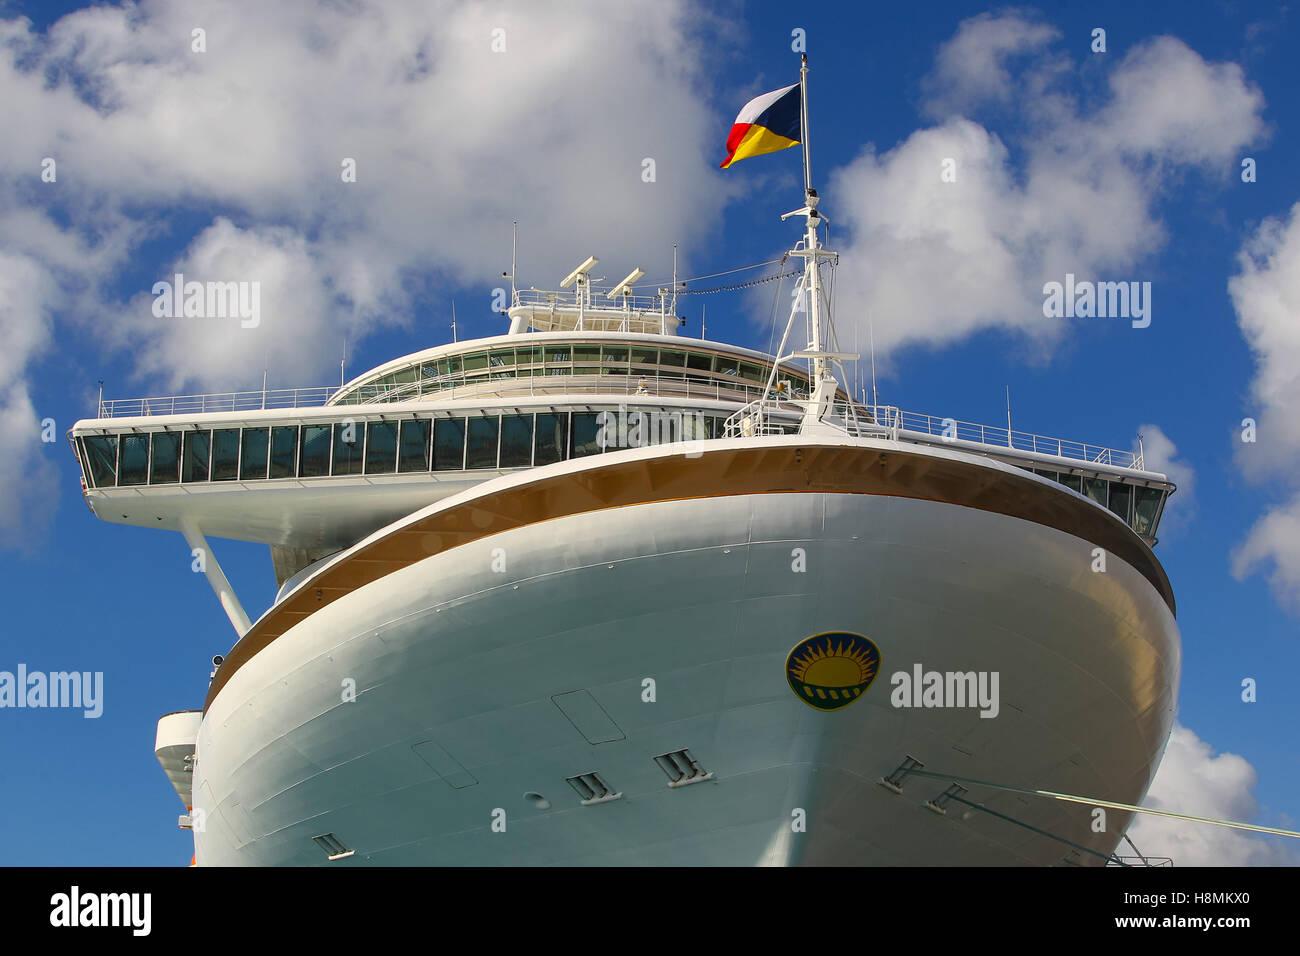 P & O Cruise ship, MS Azura - Stock Image